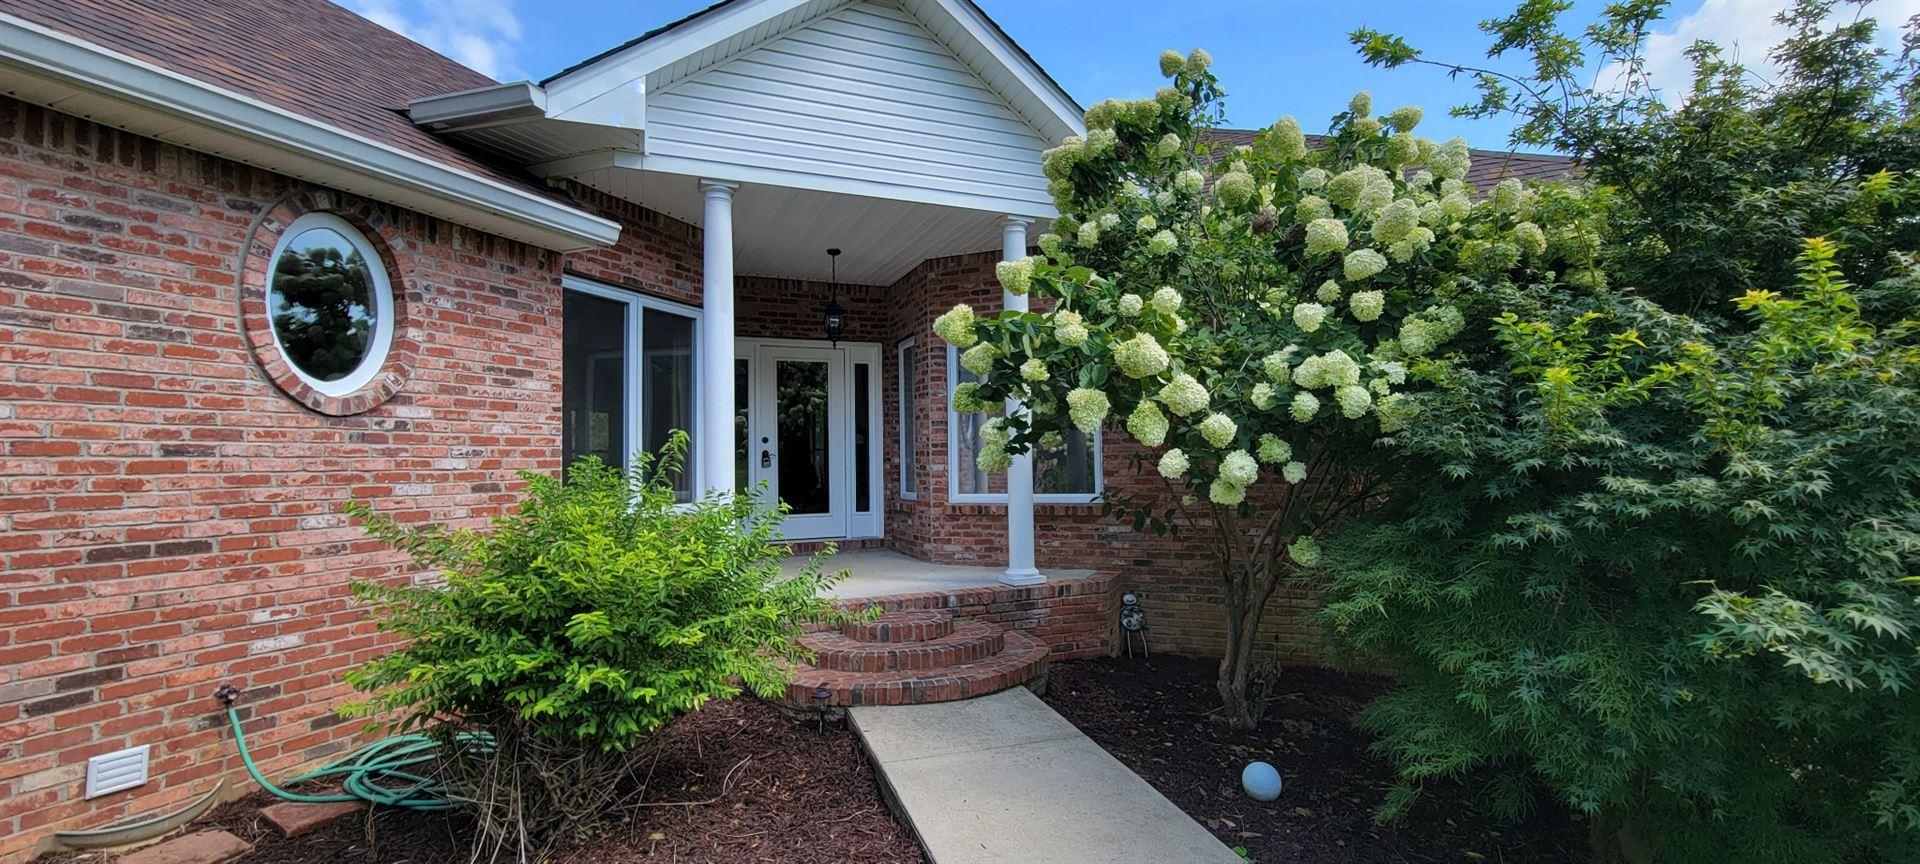 Photo of 721A Spring Street, Charlotte, TN 37036 (MLS # 2275657)